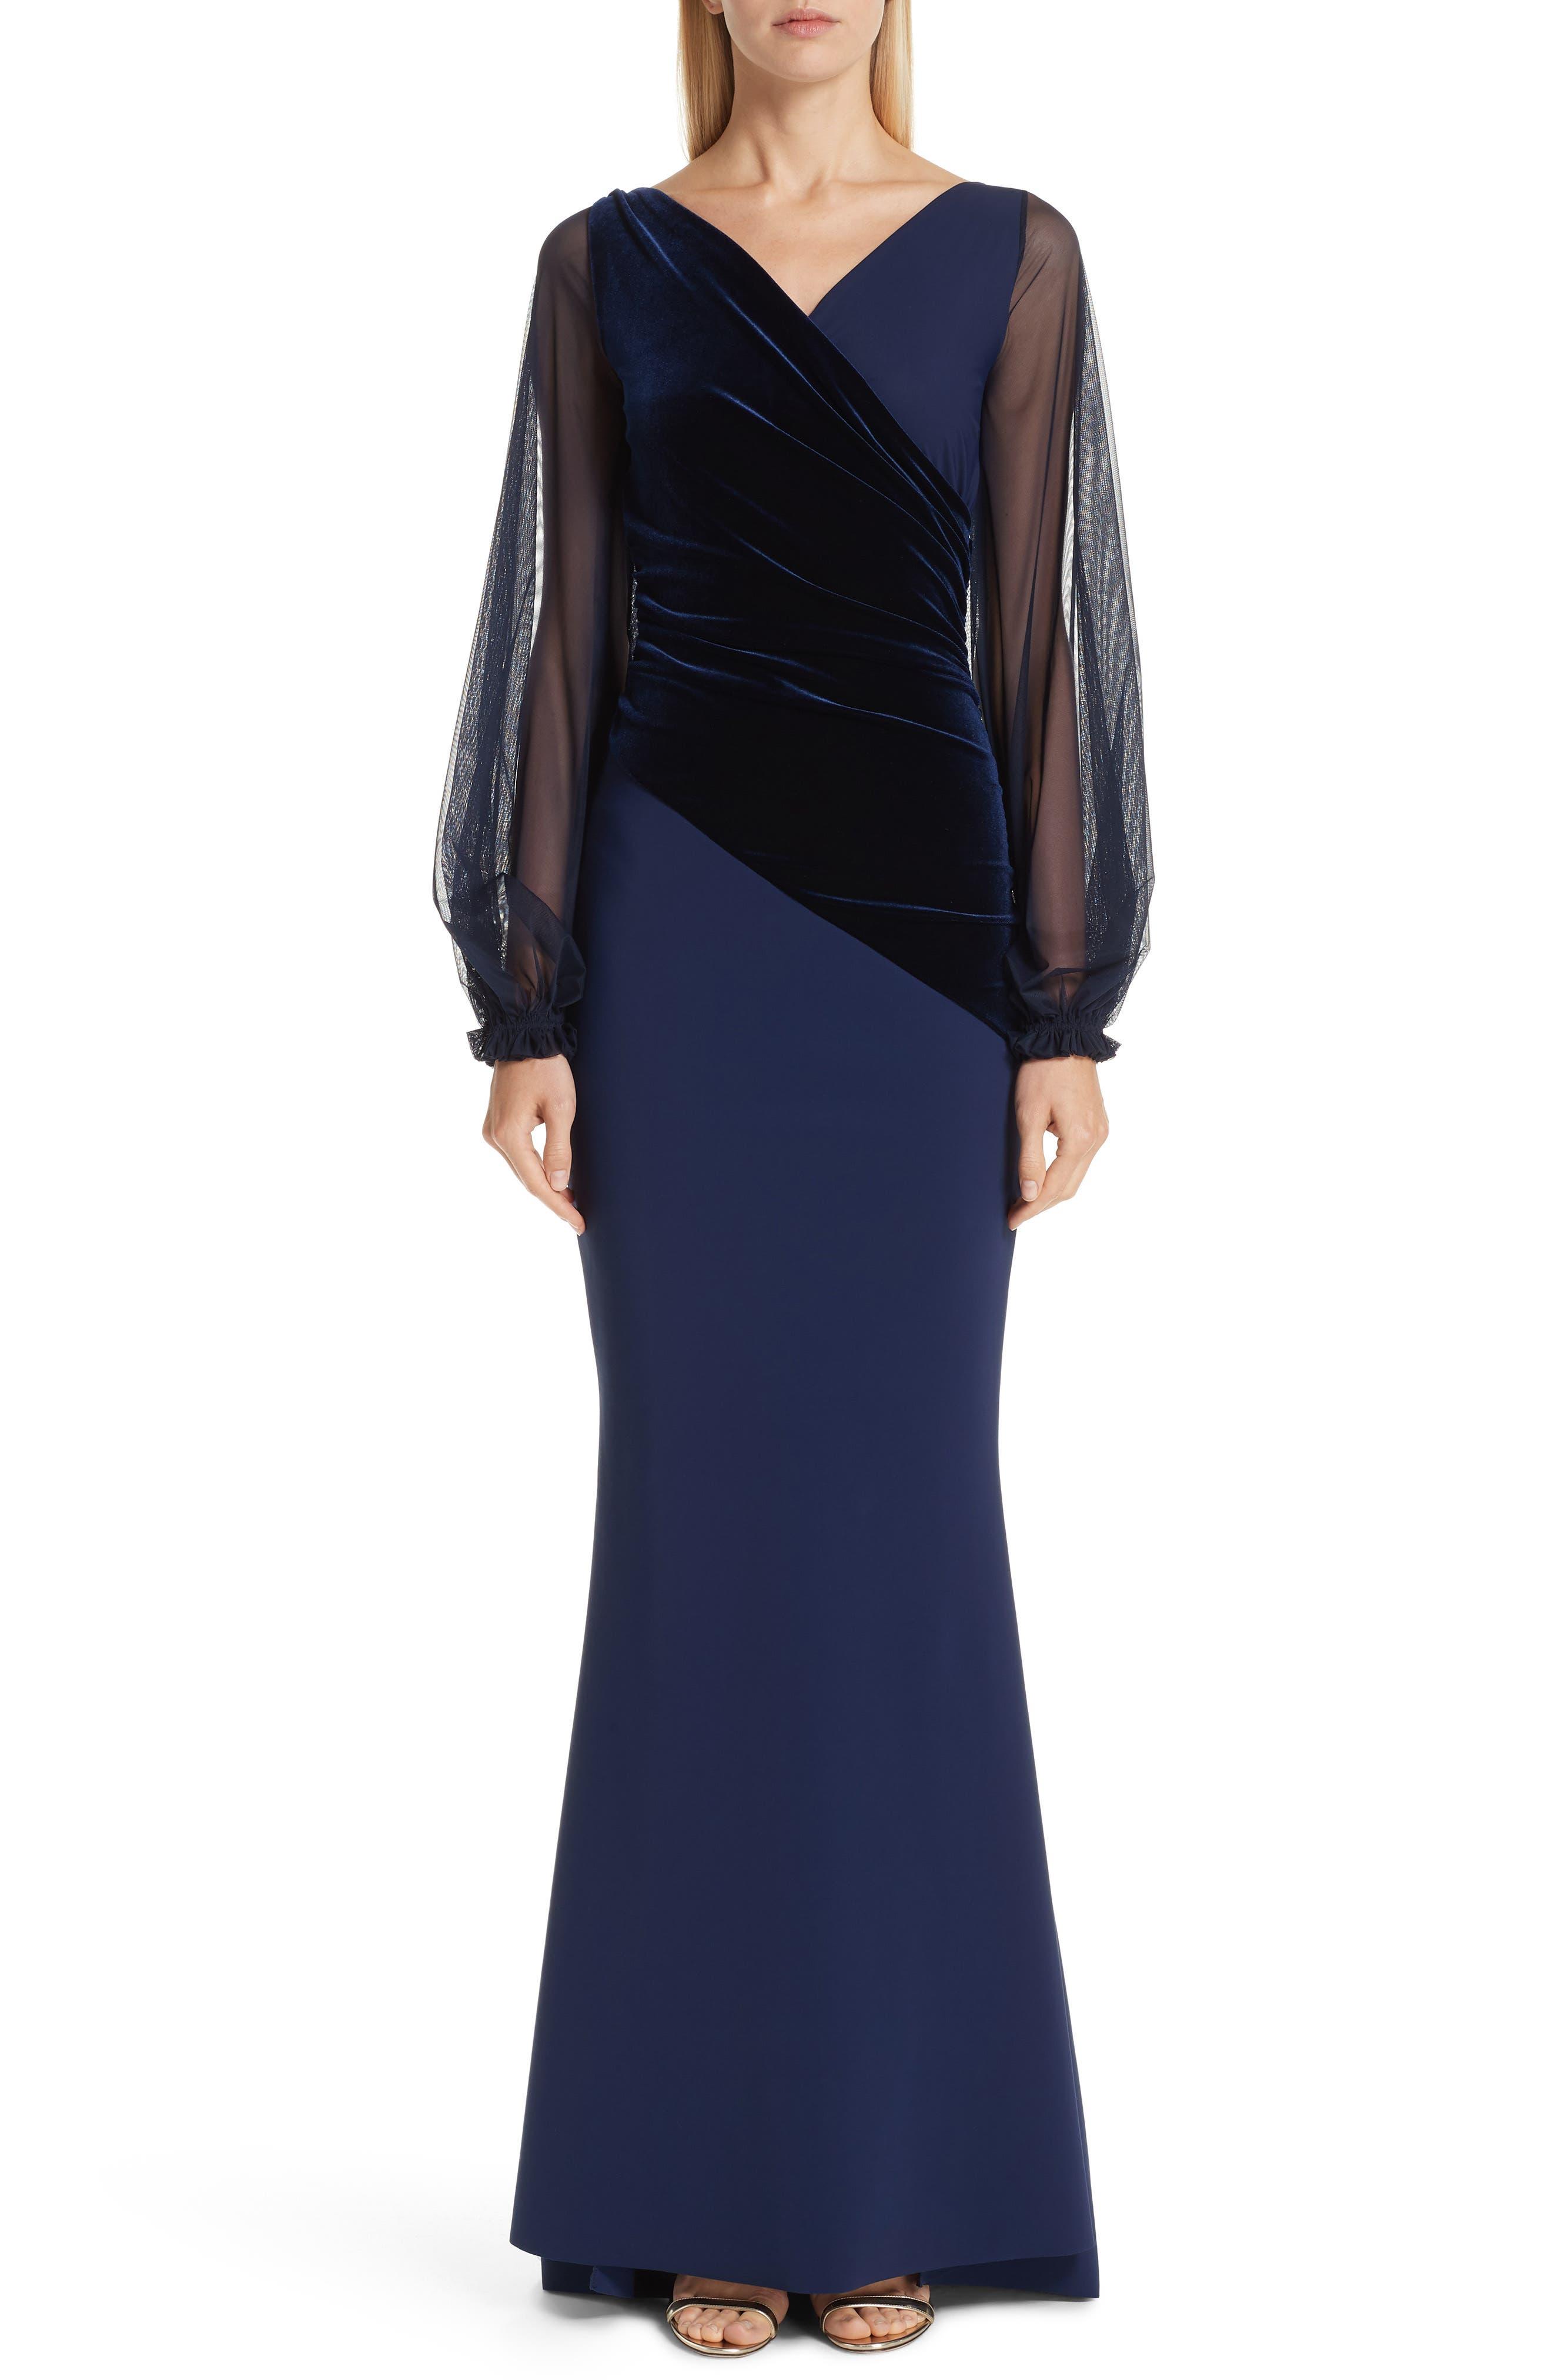 Erenira Mixed Media Gown,                         Main,                         color, BLUE NOTTE